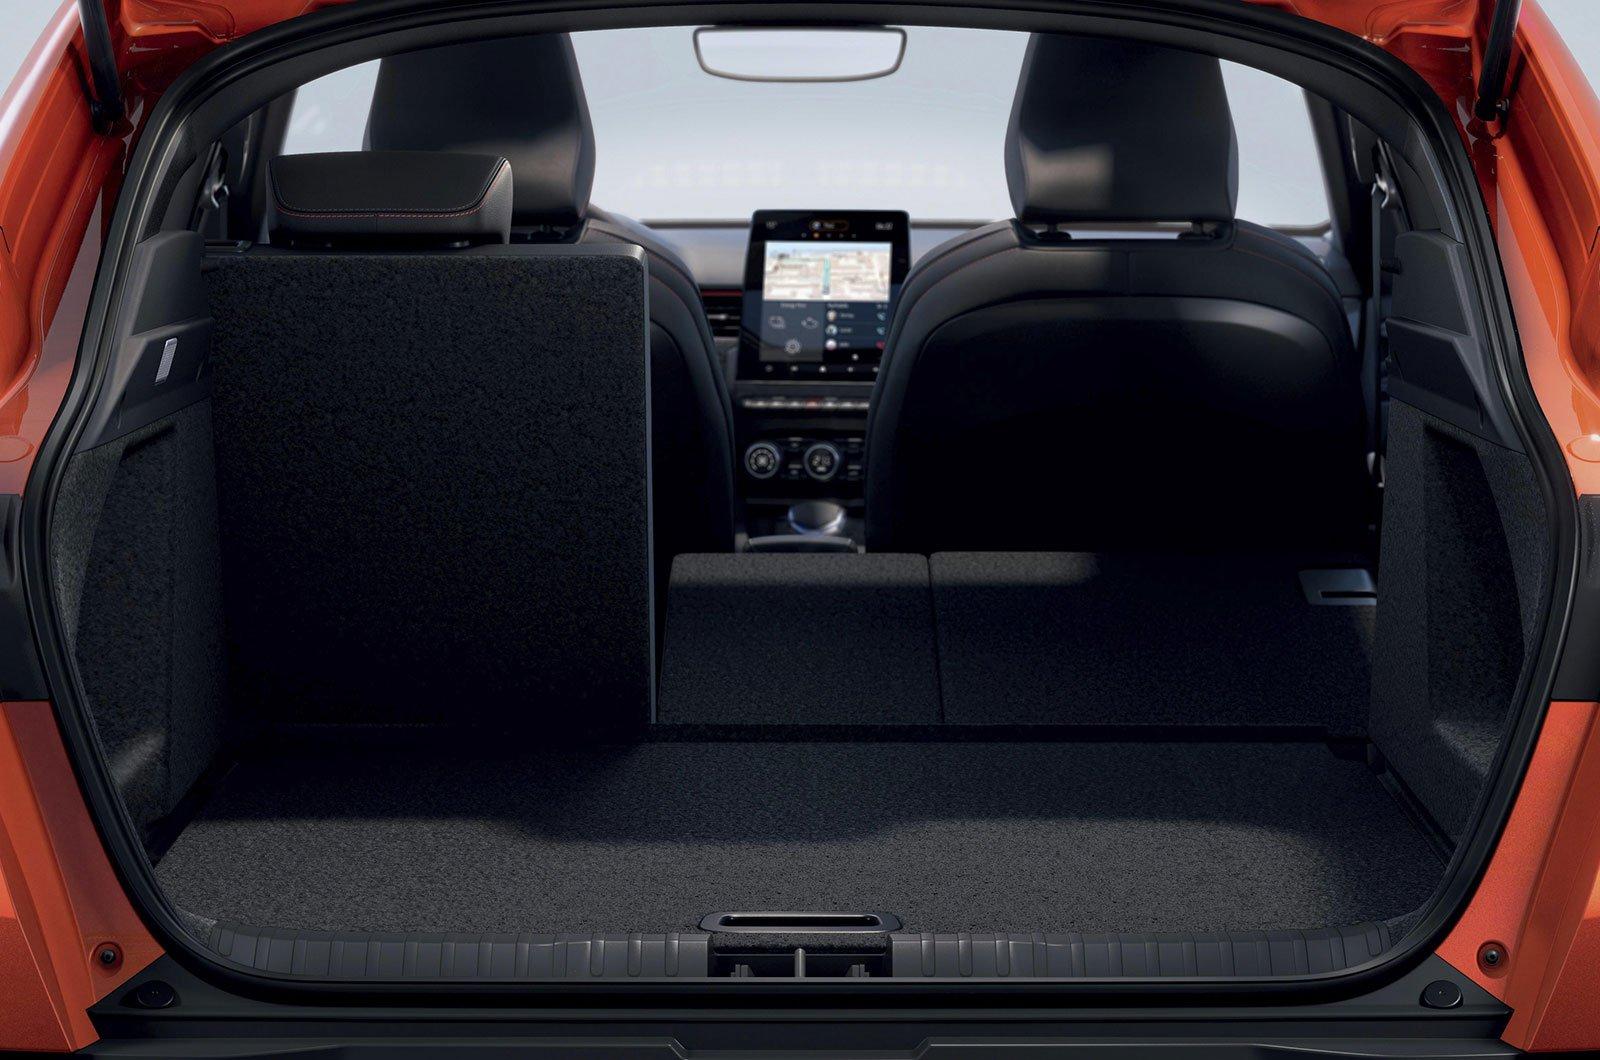 2021 Renault Arkana rear seats